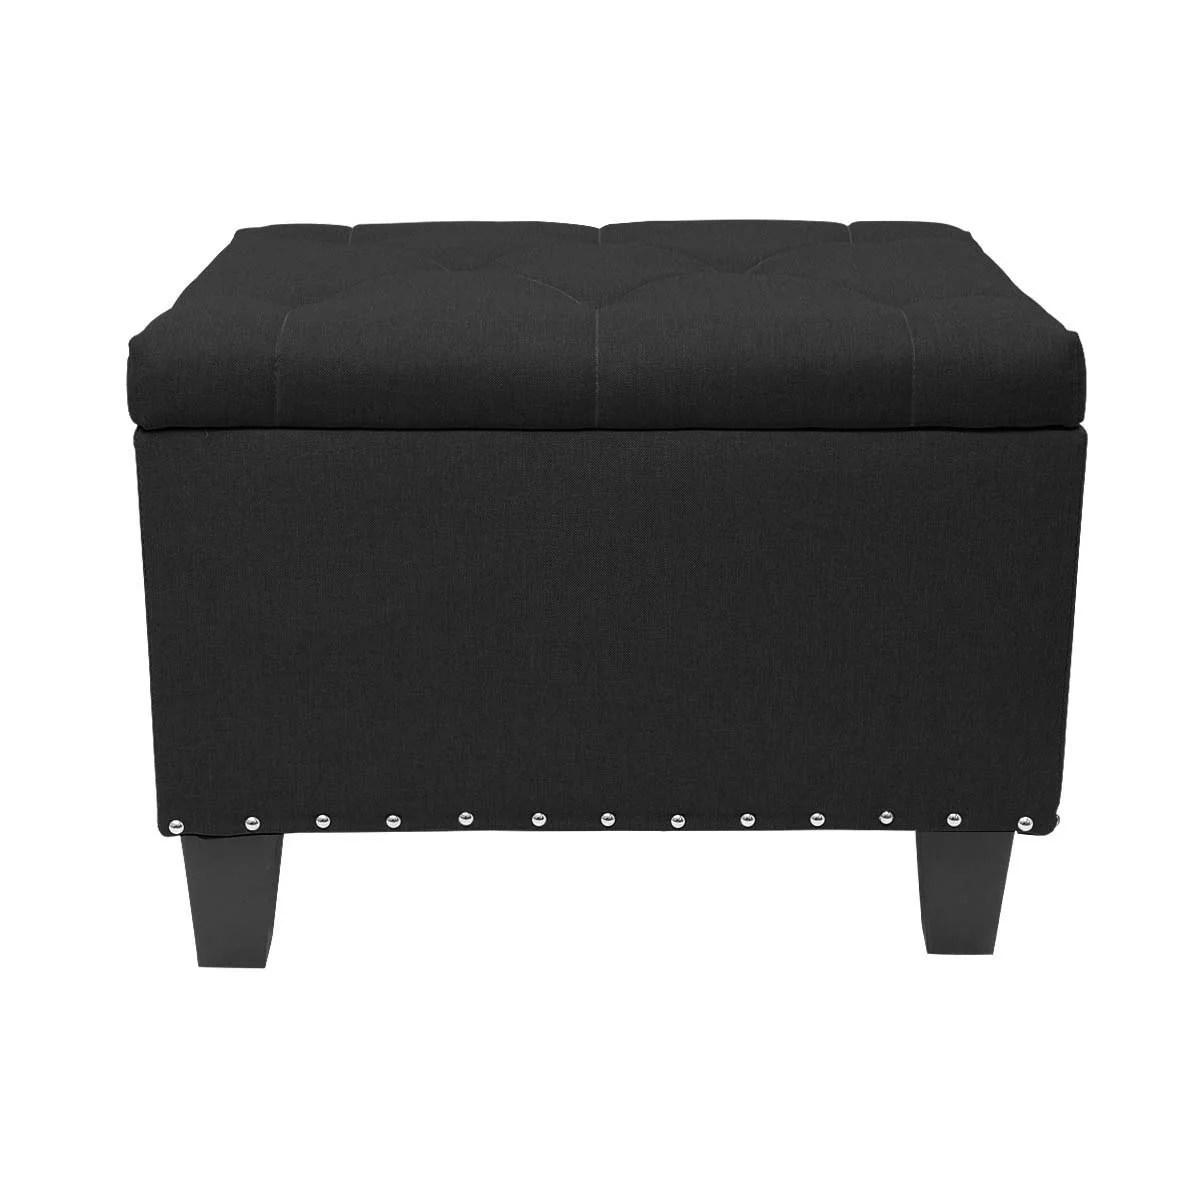 beaumont sofa bjs apartment sectional recliner storage ottomans walmart com